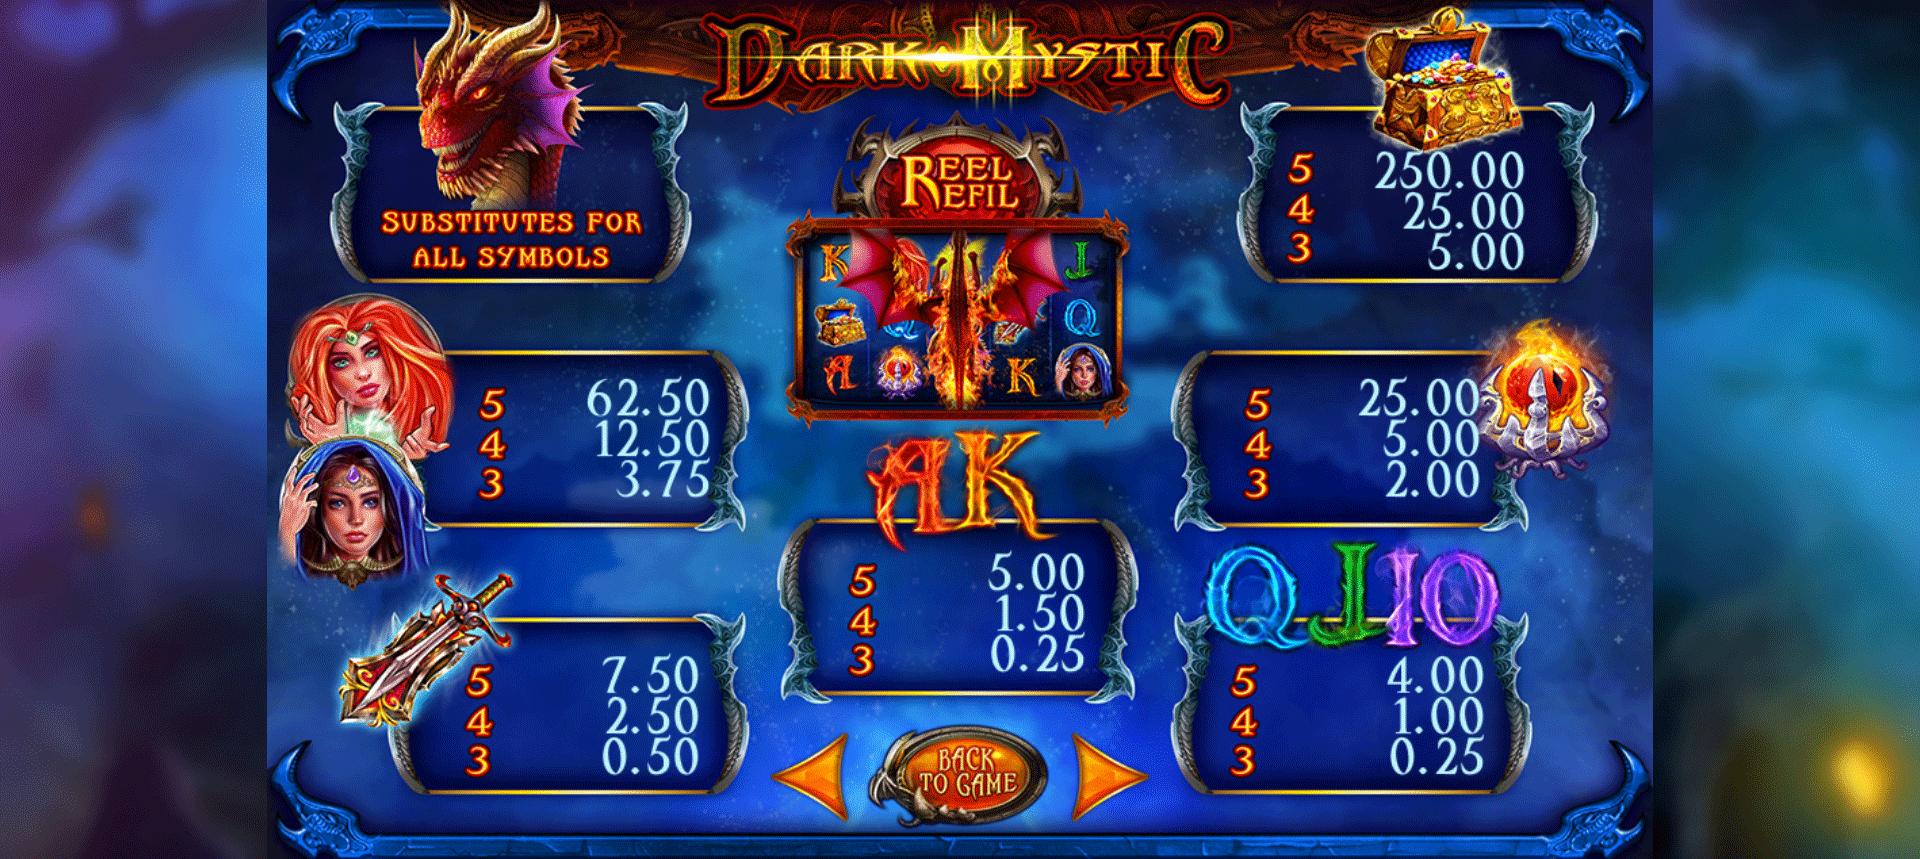 simboli del gioco slot machine dark mystic